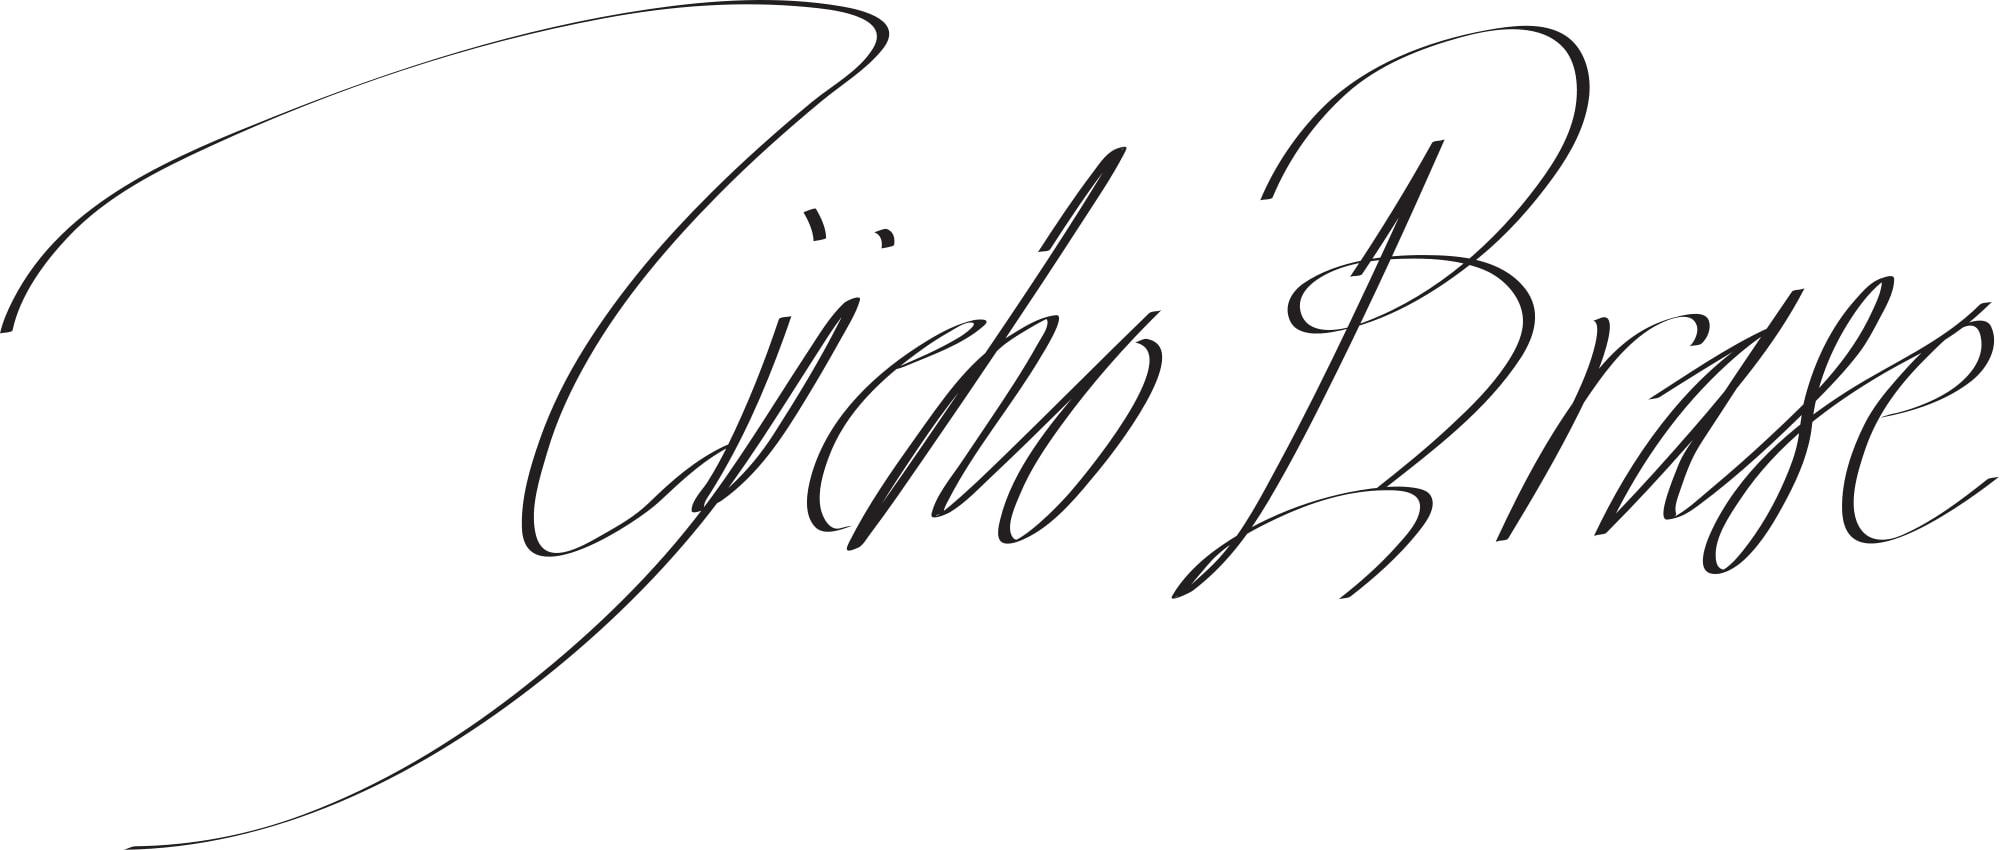 tycho_signature